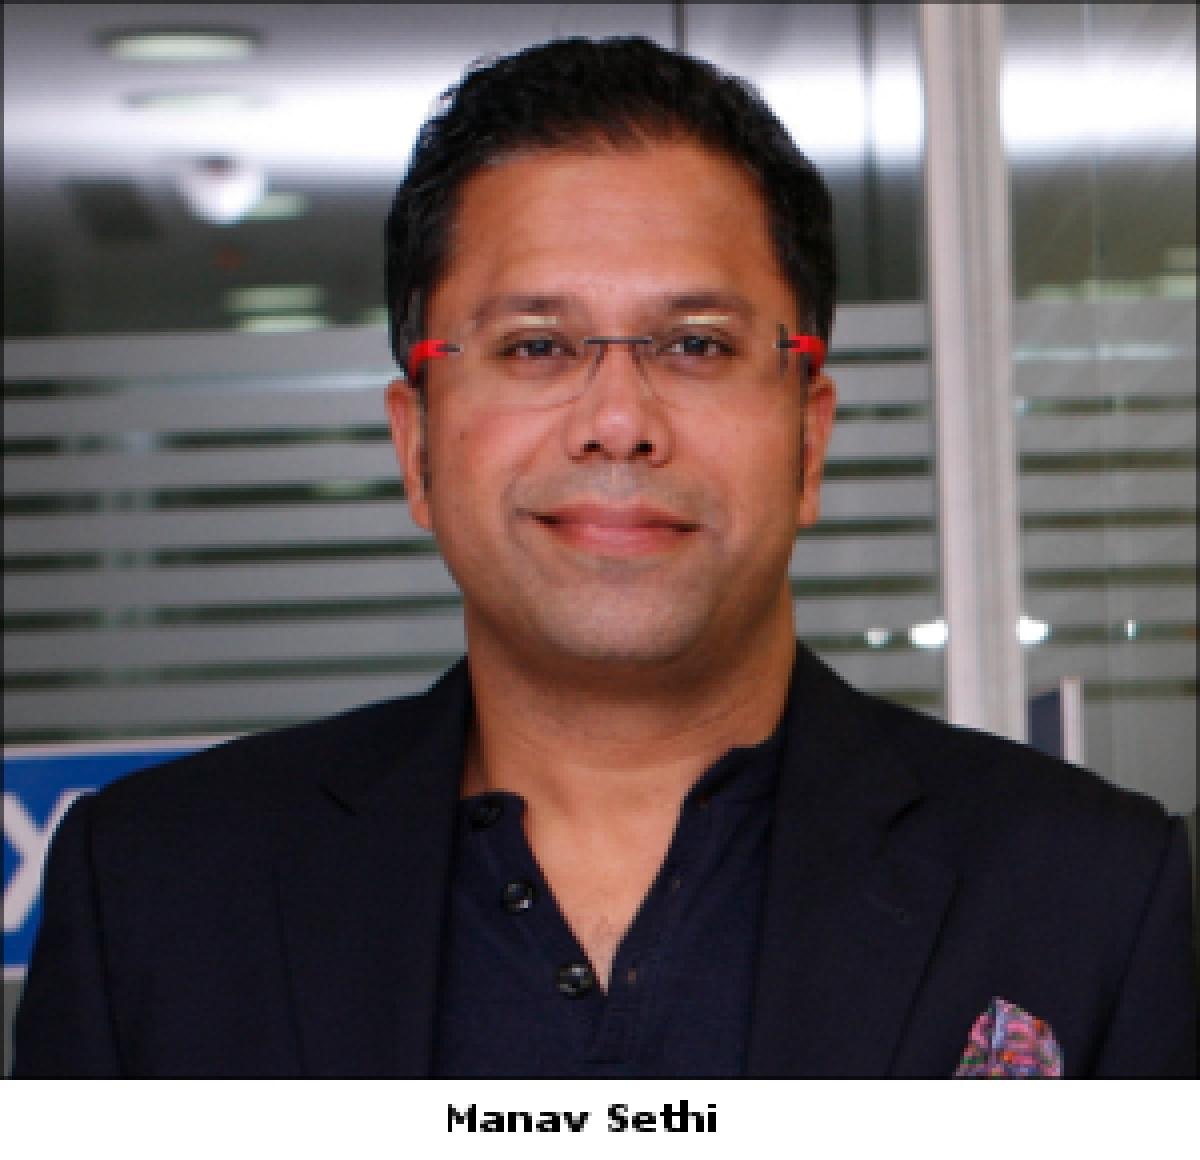 ALT Balaji appoints Manav Sethi as marketing chief